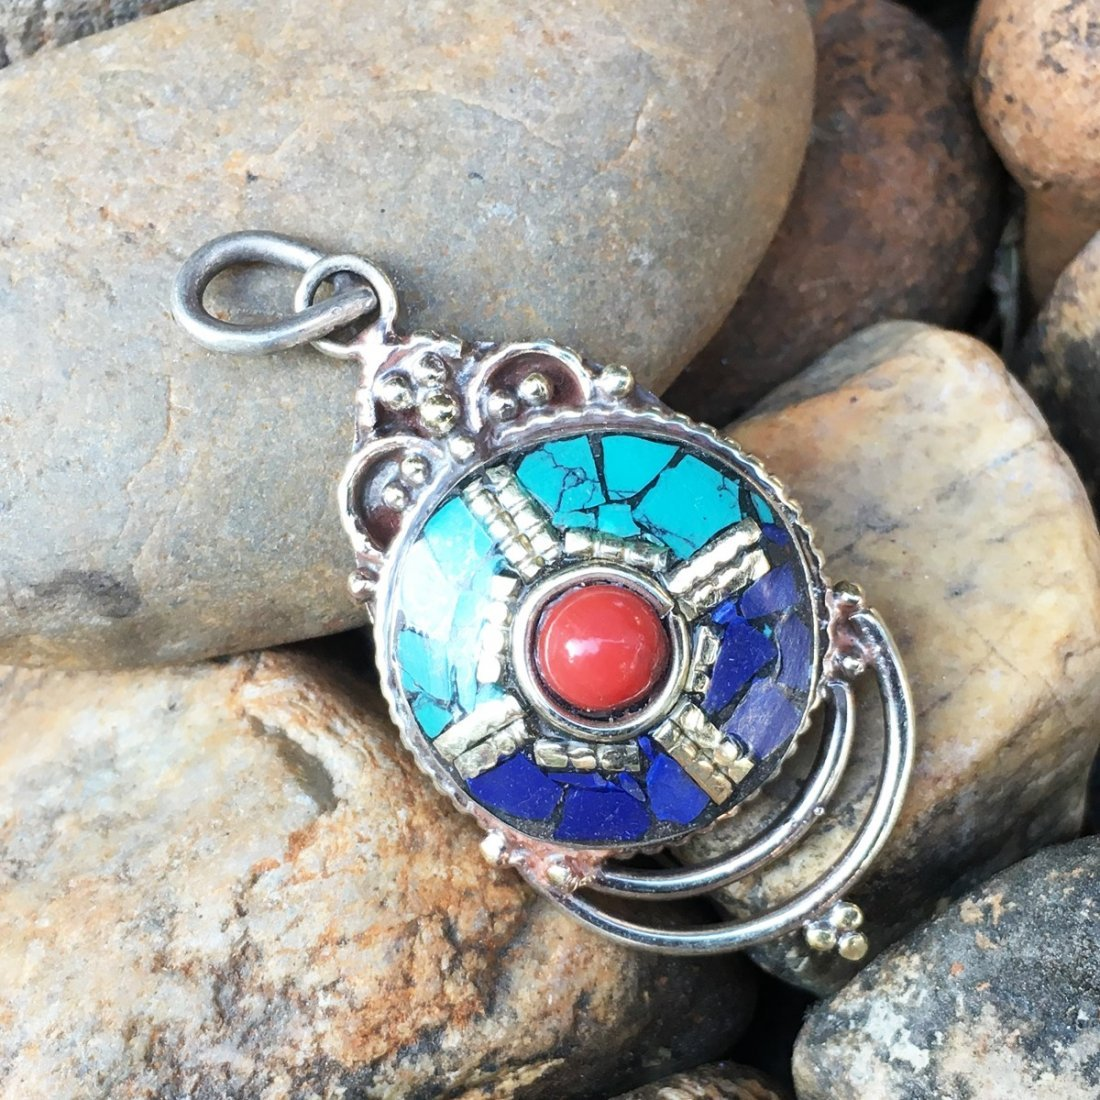 Turquoise & Lapis Tibetan Silver Handmade Pendant